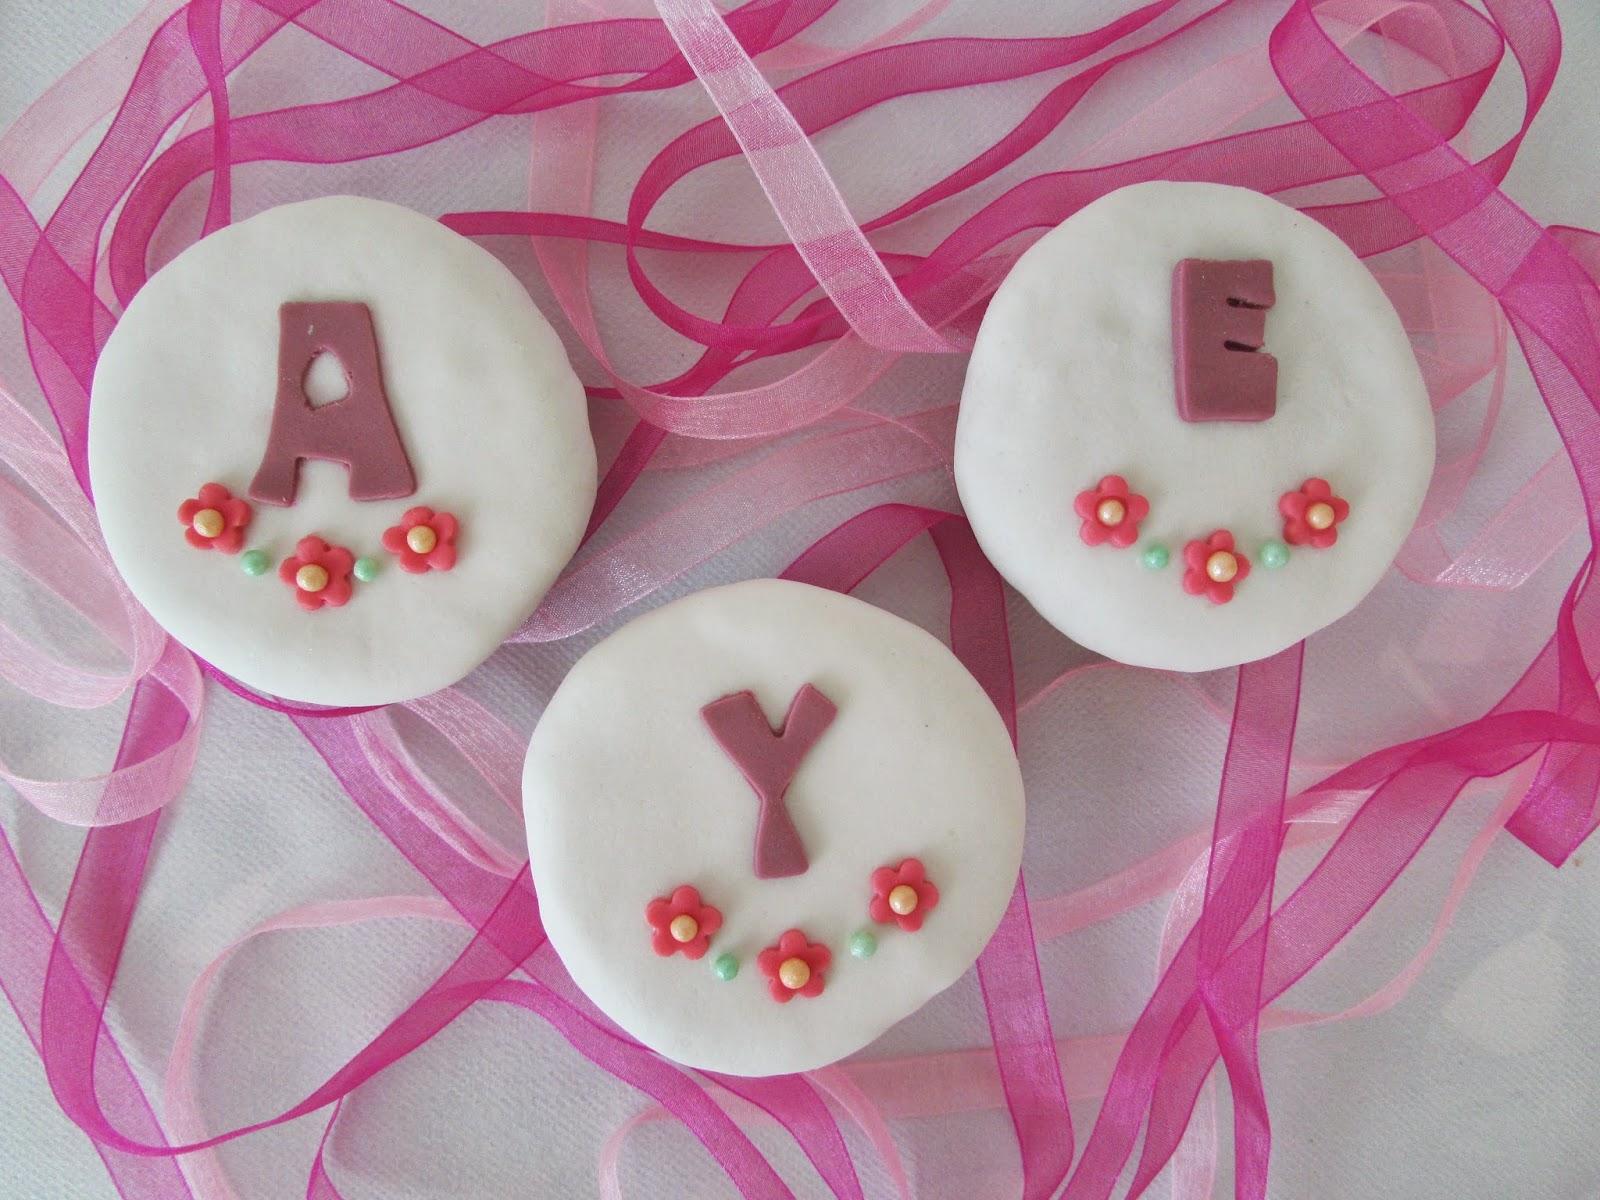 cupcakes-limon-letras-fondat